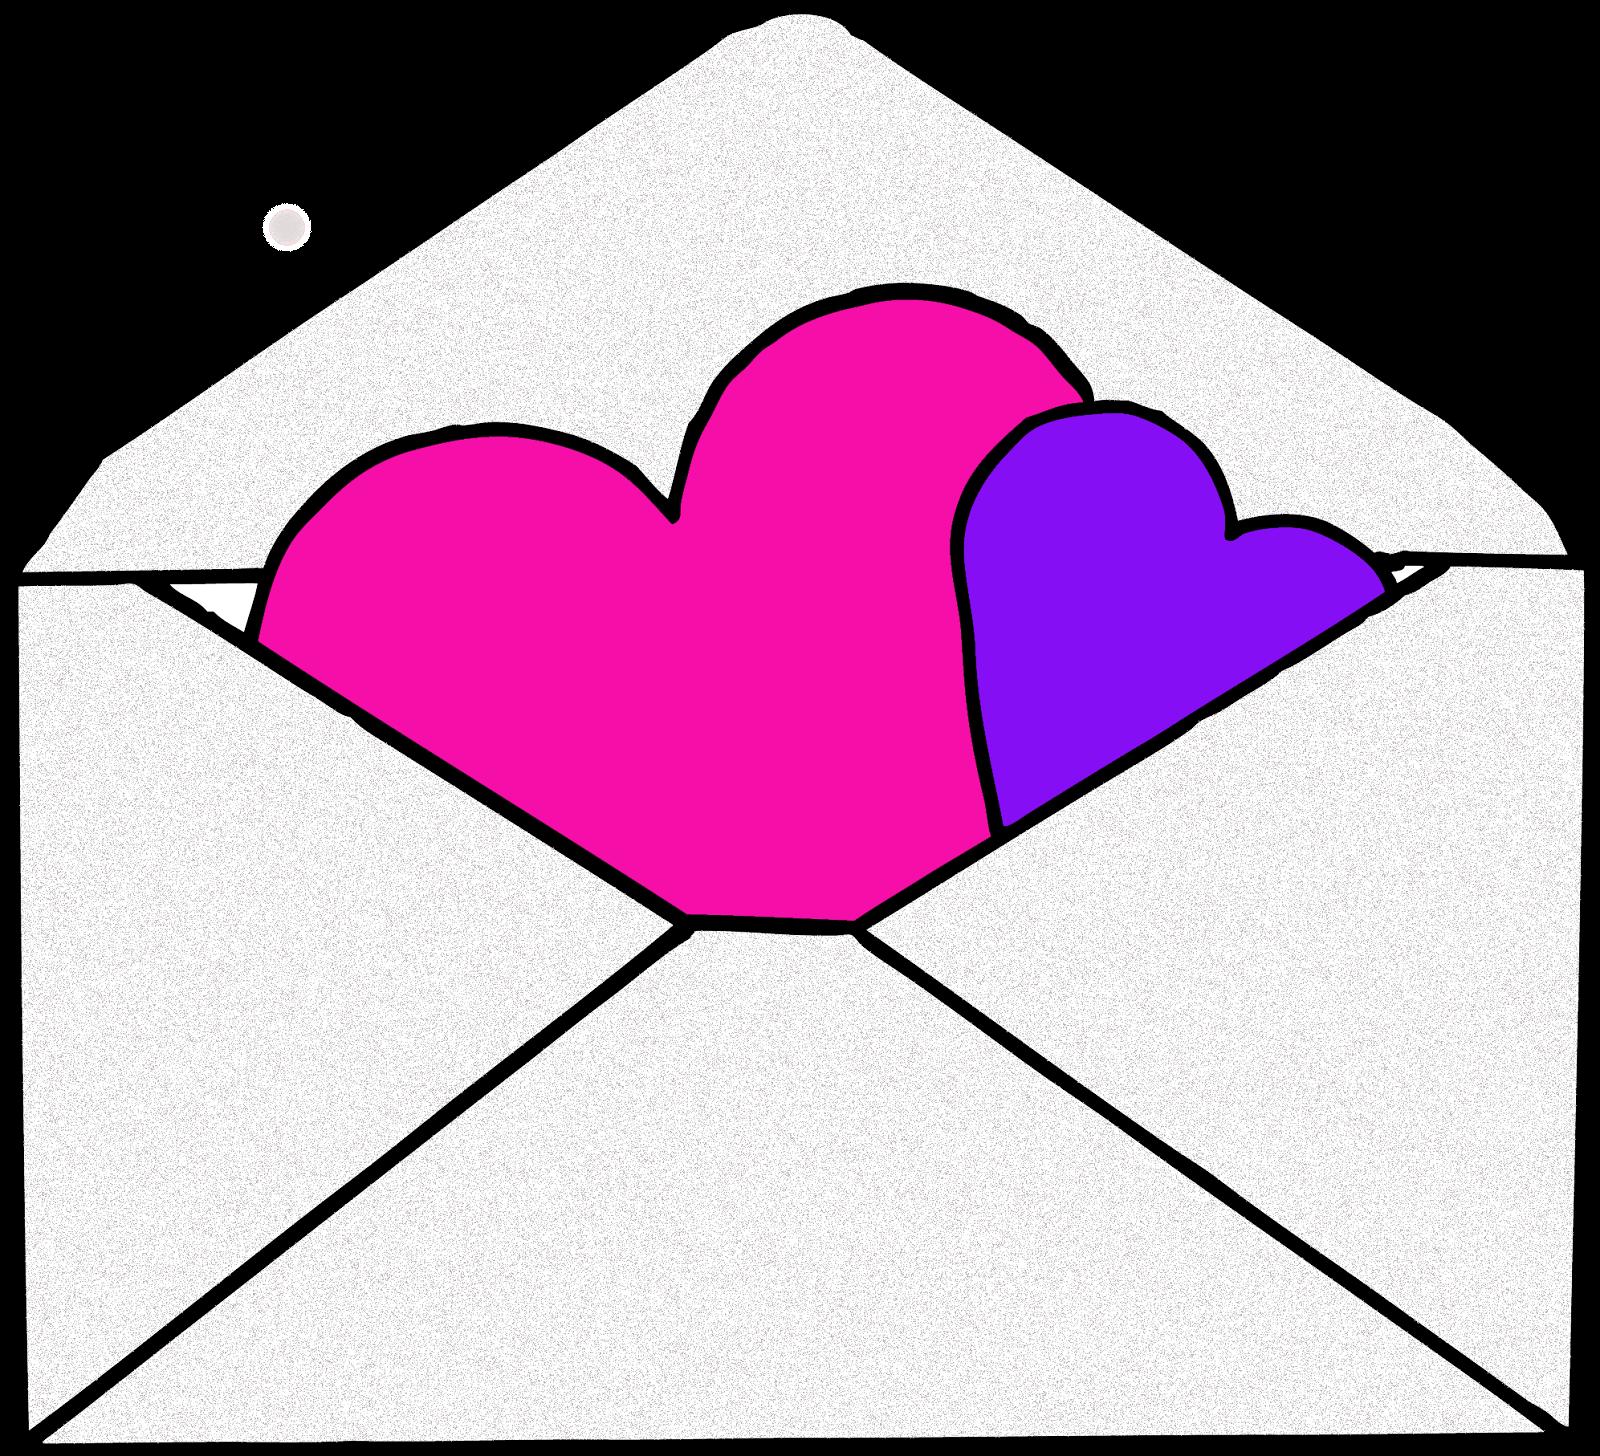 Offering envelopes clipart banner black and white stock Offering Envelopes Cliparts | Free download best Offering ... banner black and white stock